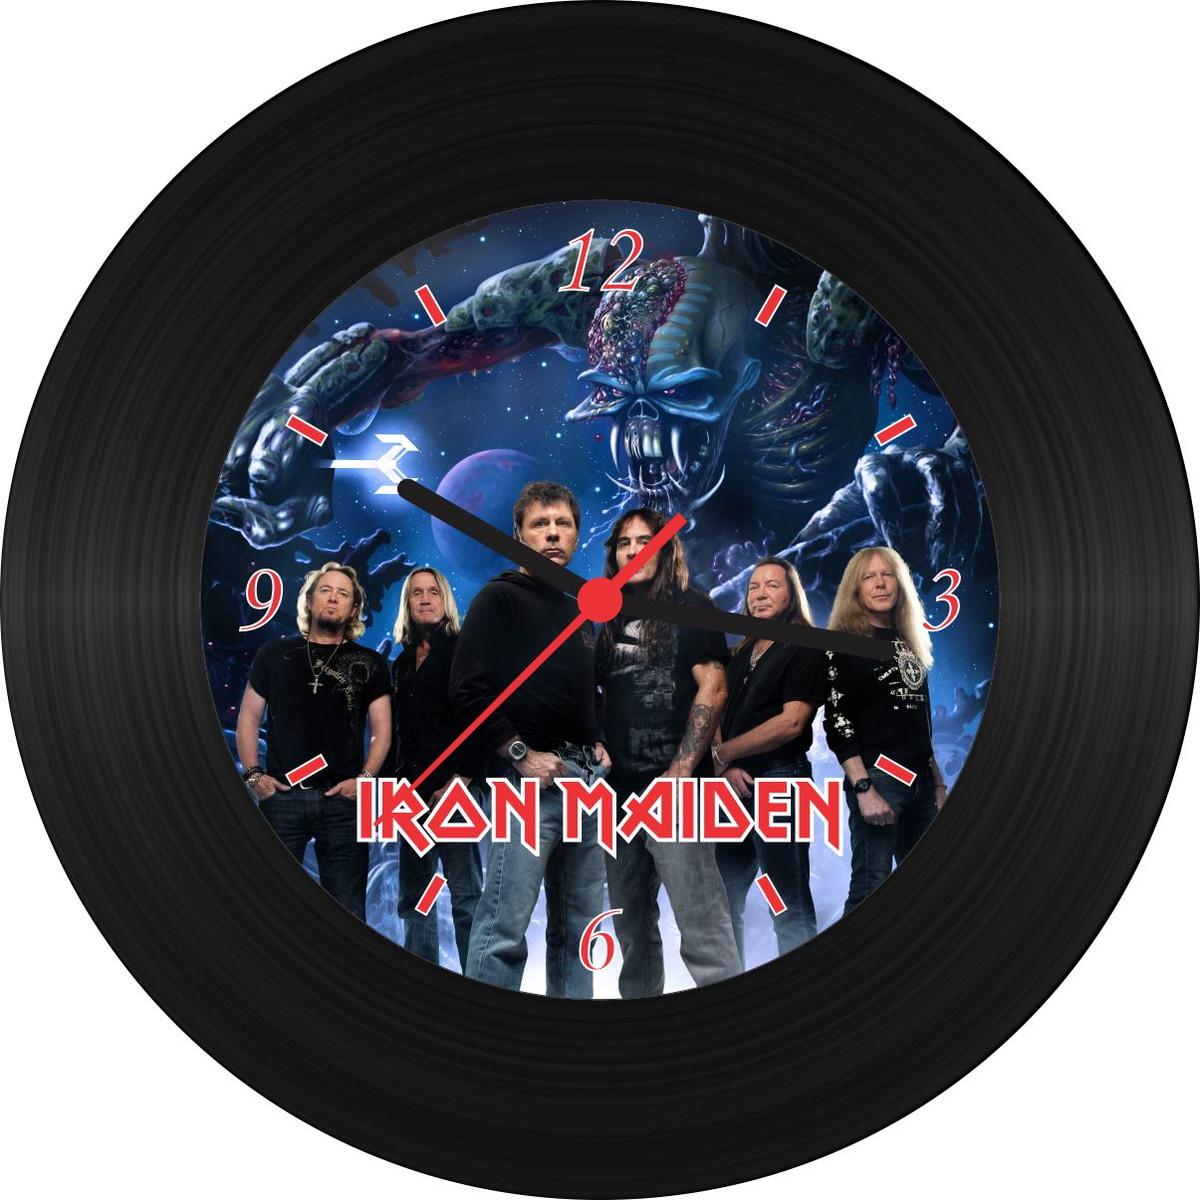 62f1b21ddd Relógio de Vinil - Iron Maiden no Elo7   Recife Art Vinil - Produtos ...